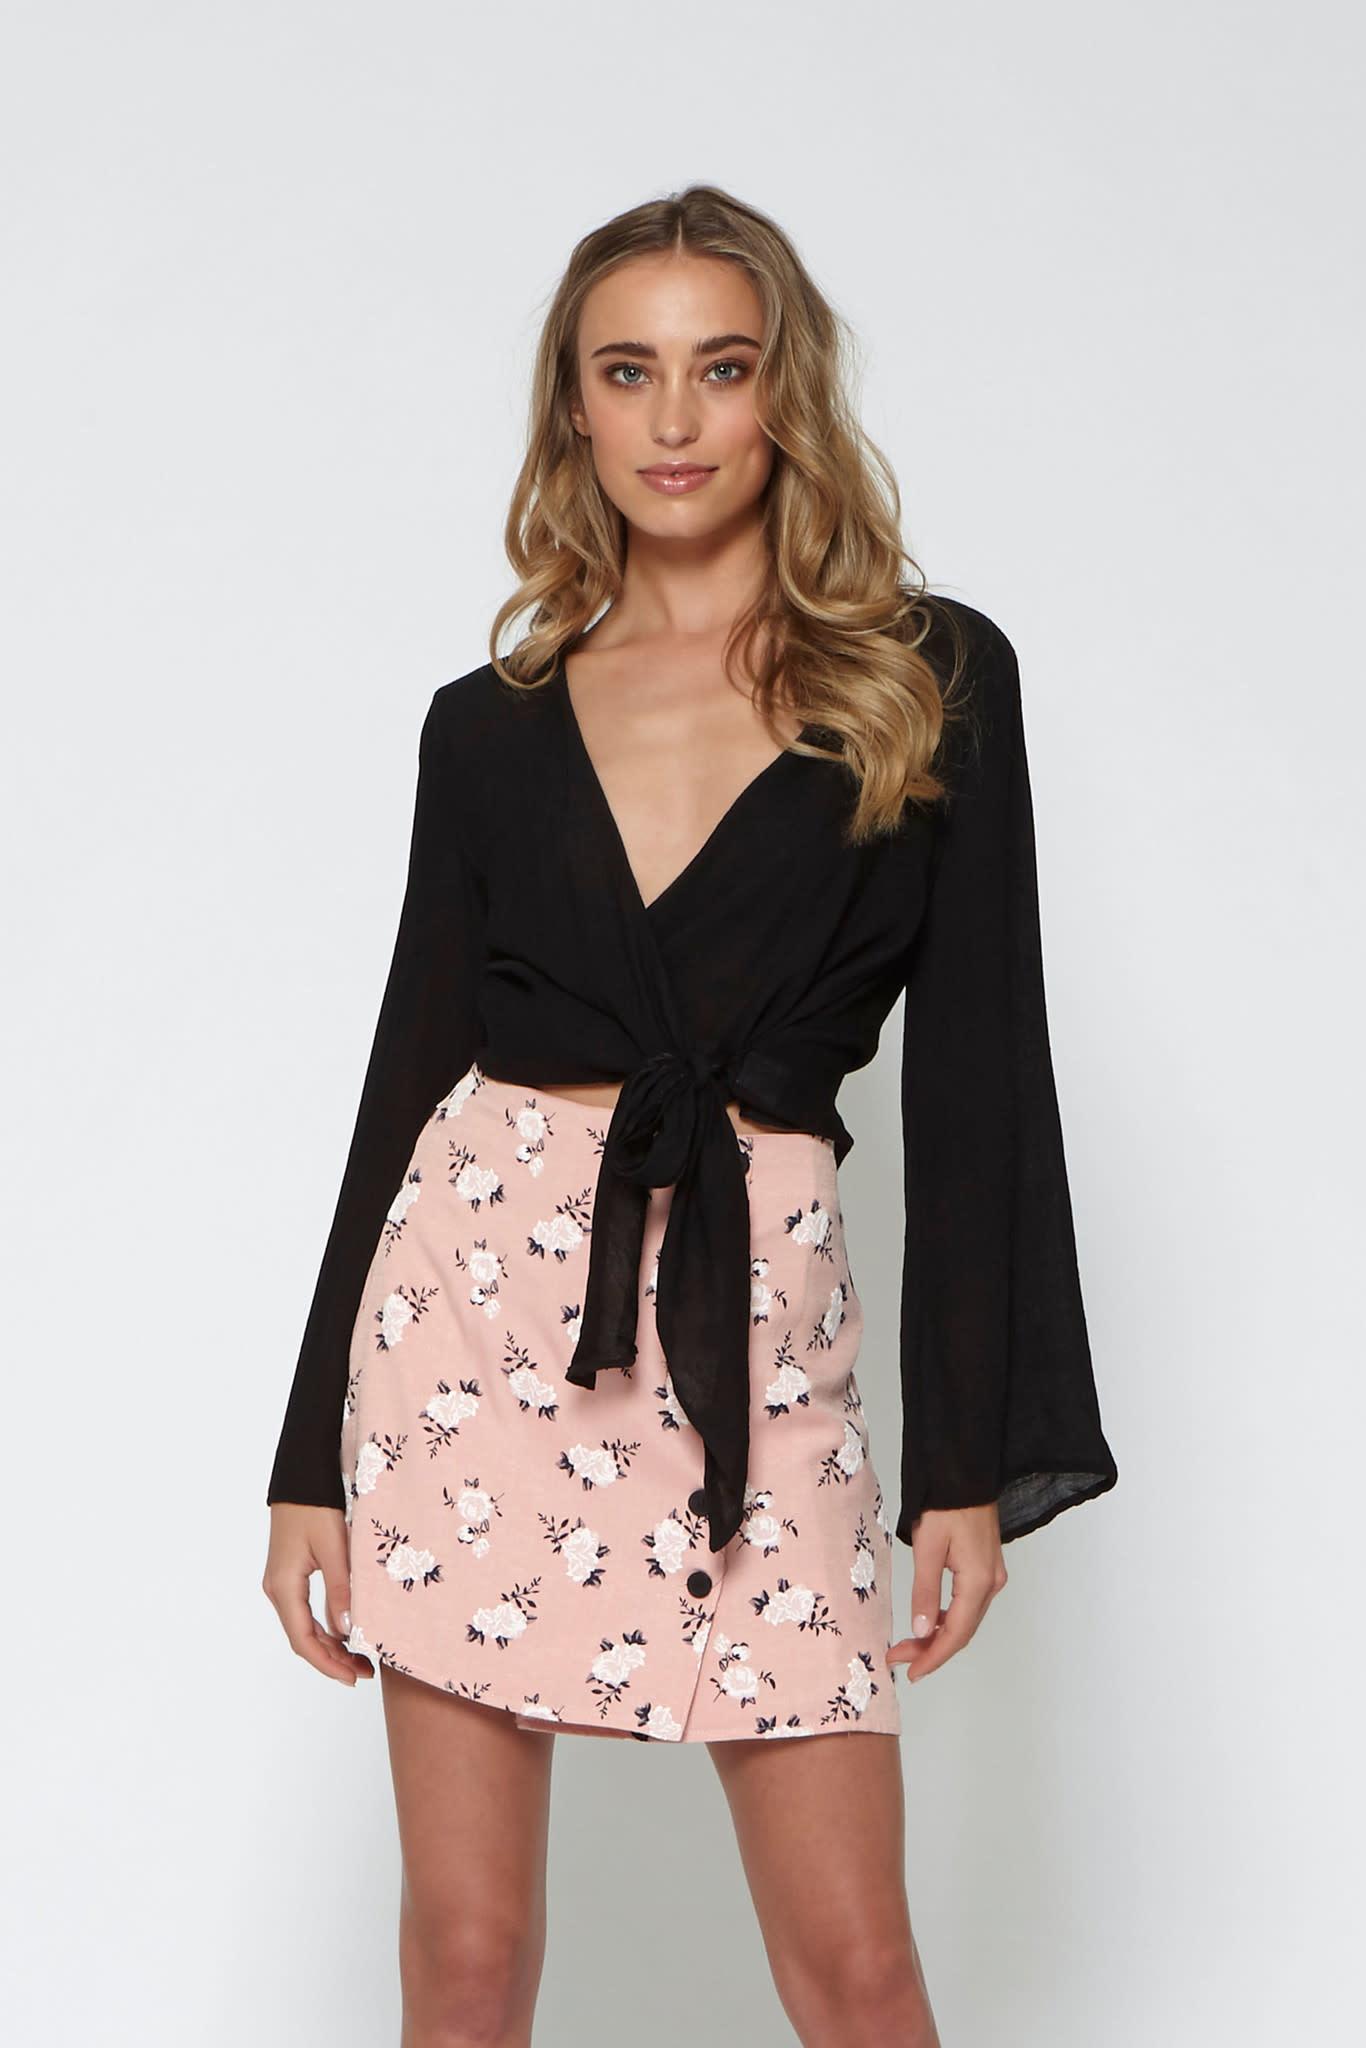 Skirt Noella MC34 pink